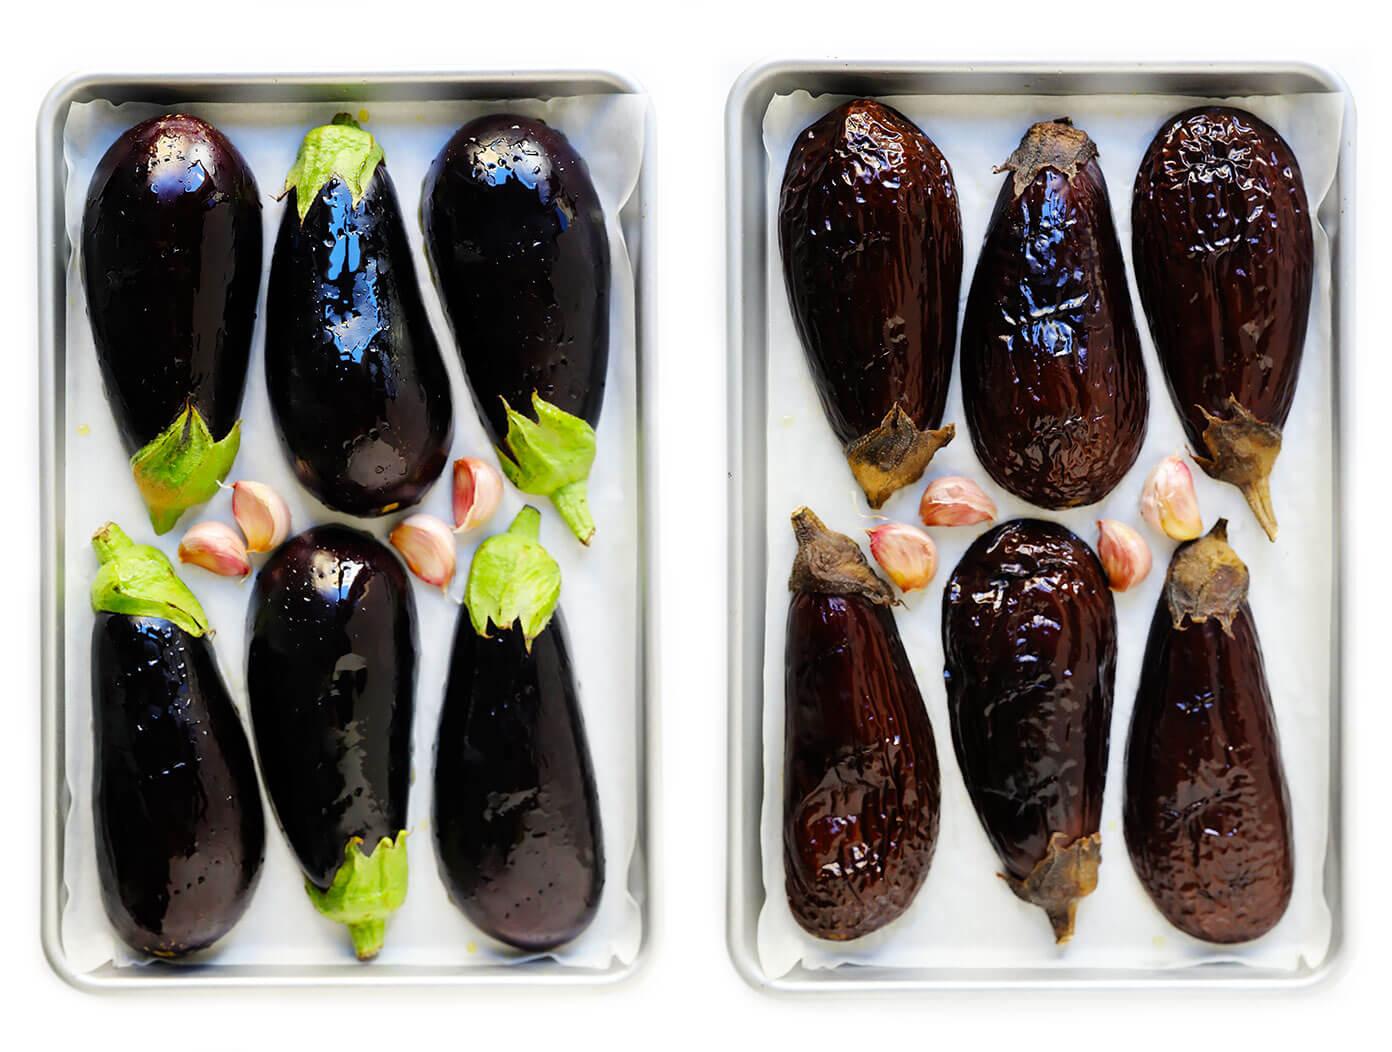 Roasted Eggplant and Garlic